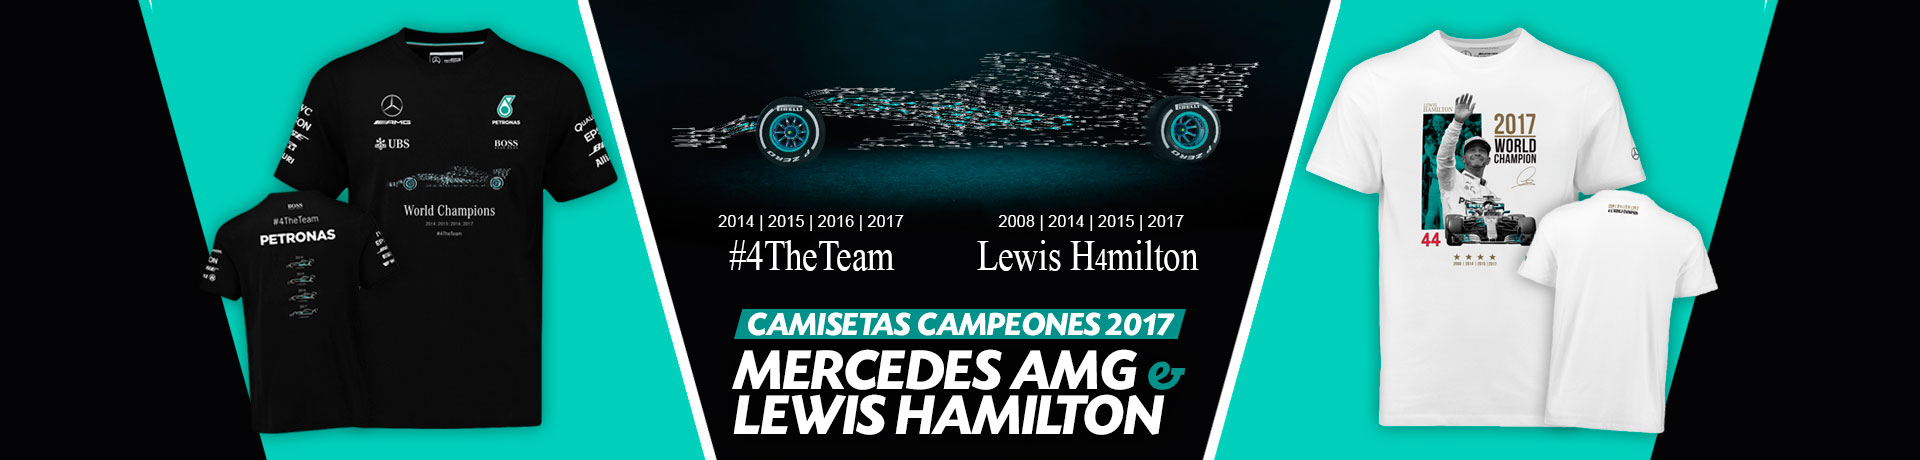 Camiseta oficial Mercedes y Lewis Hamilton